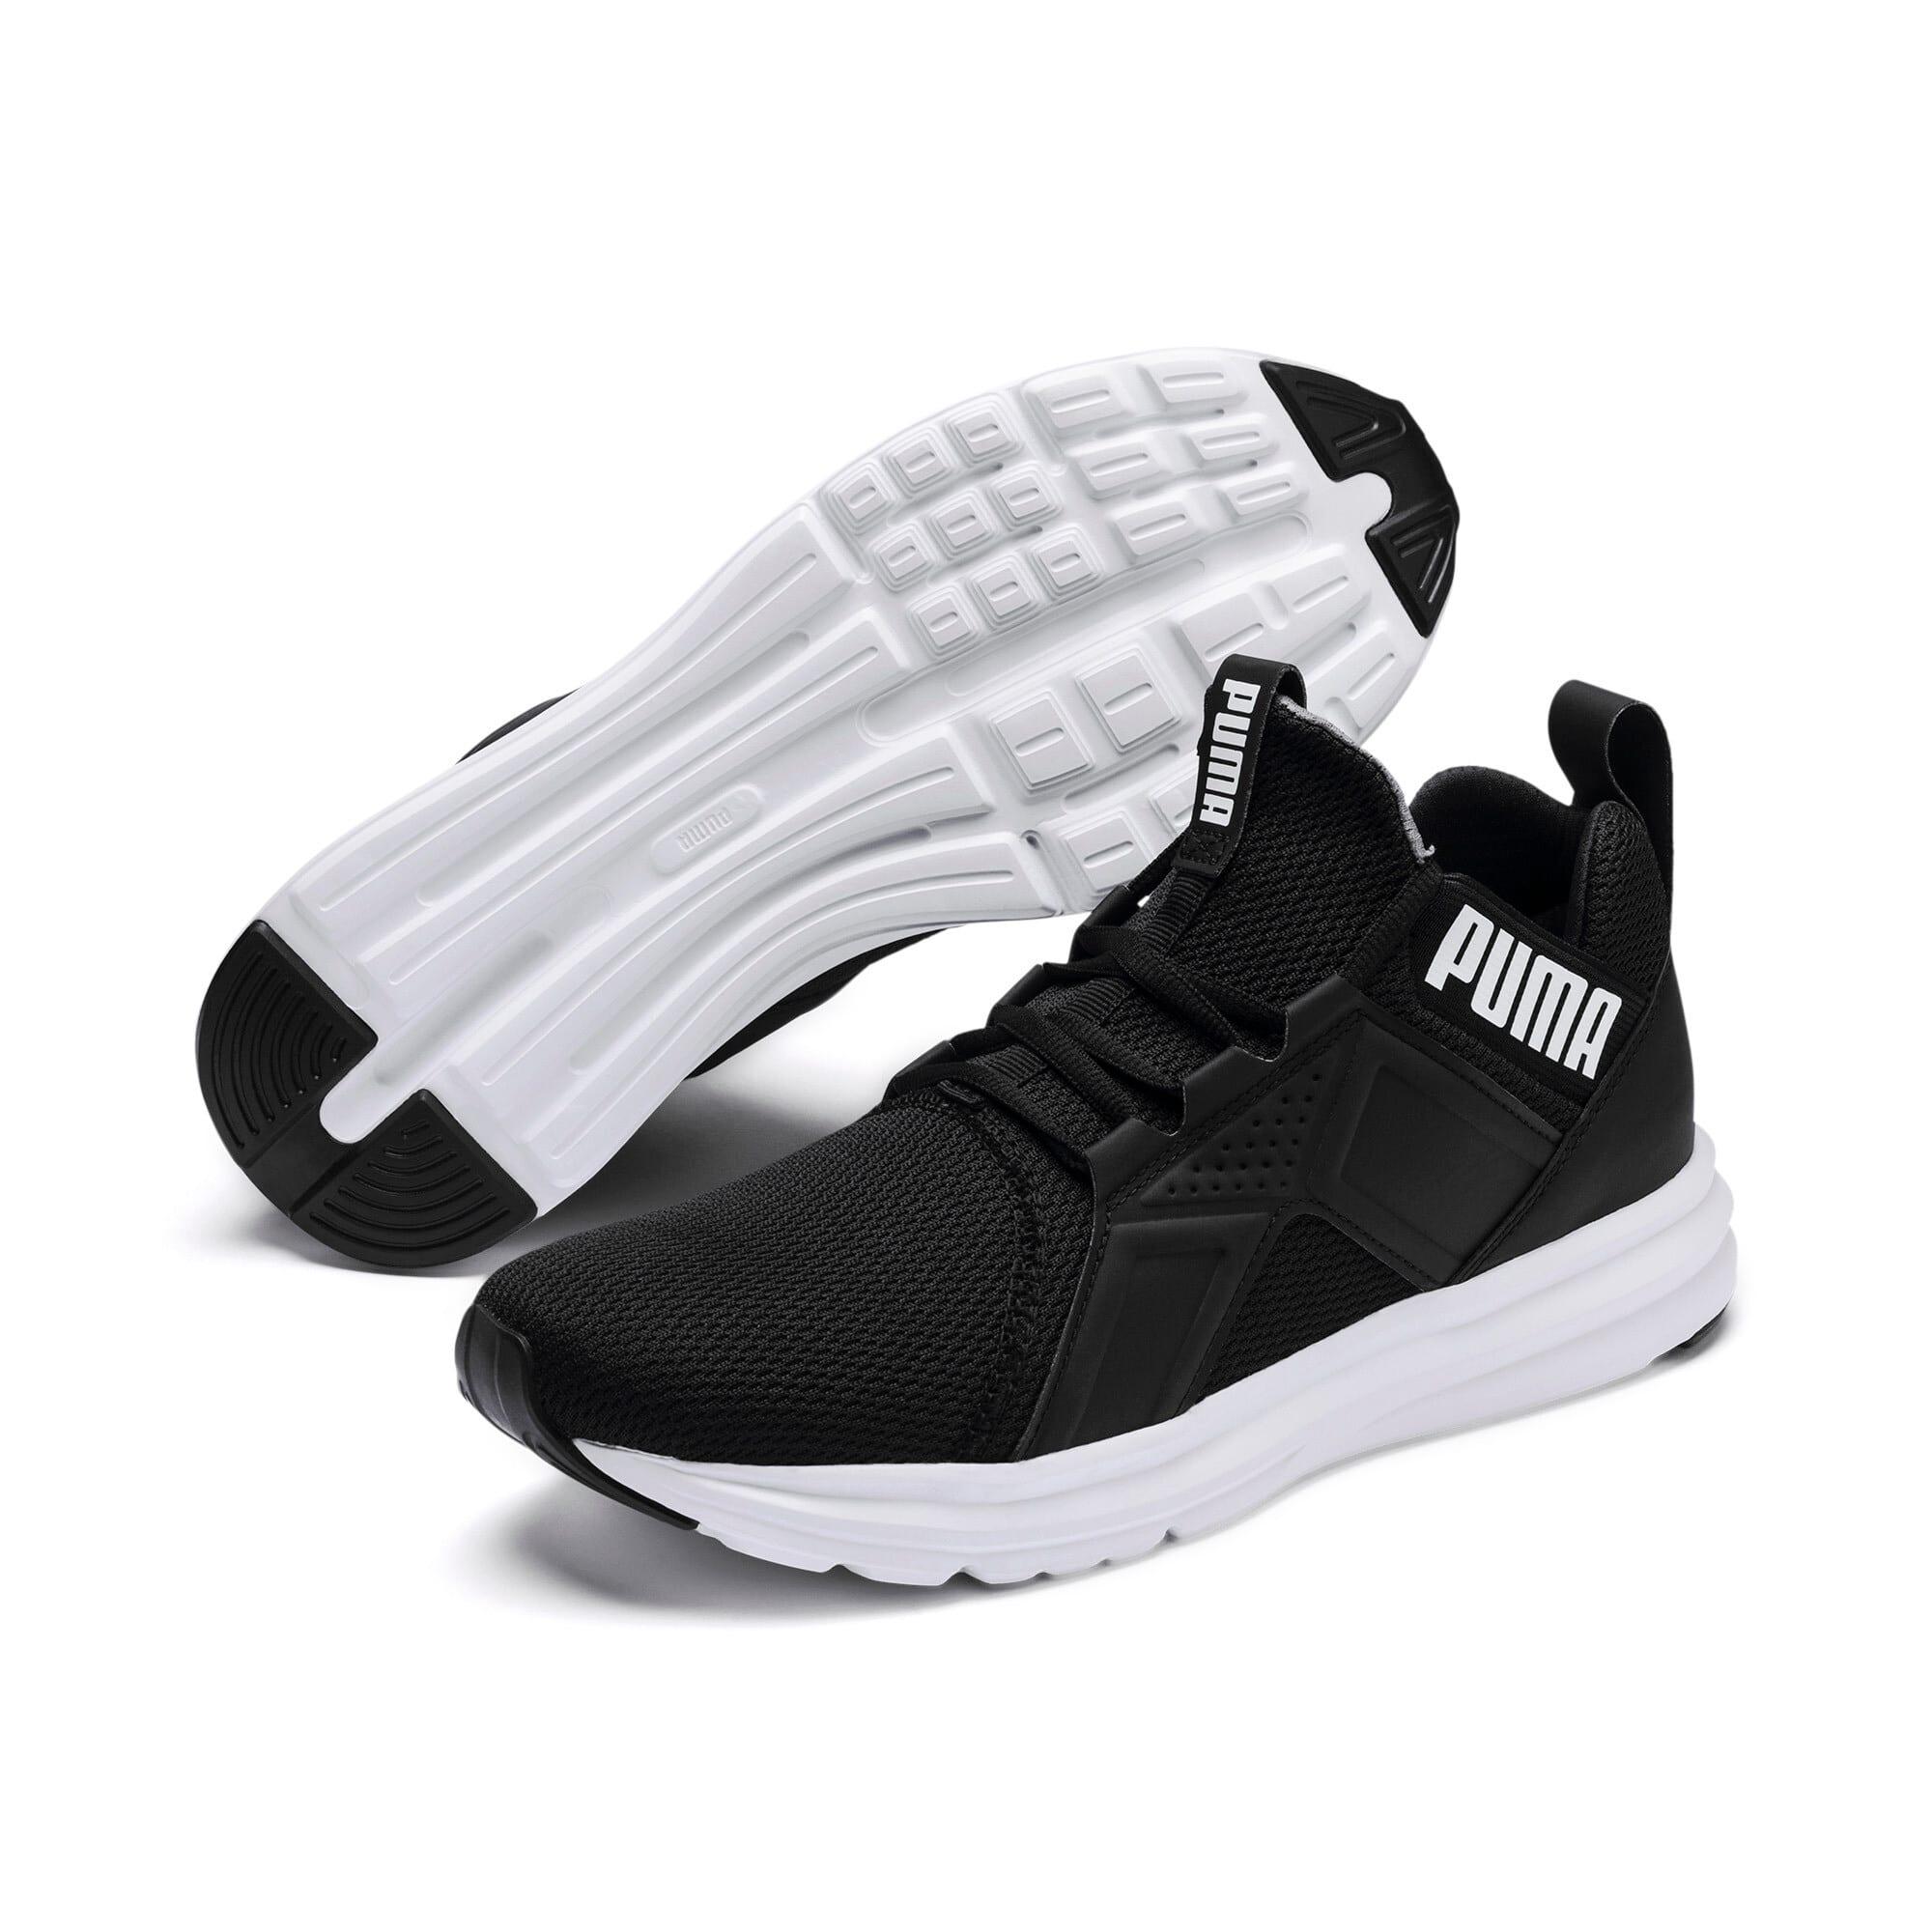 Thumbnail 3 of Enzo Sport Herren Sneaker, Puma Black-Puma White, medium